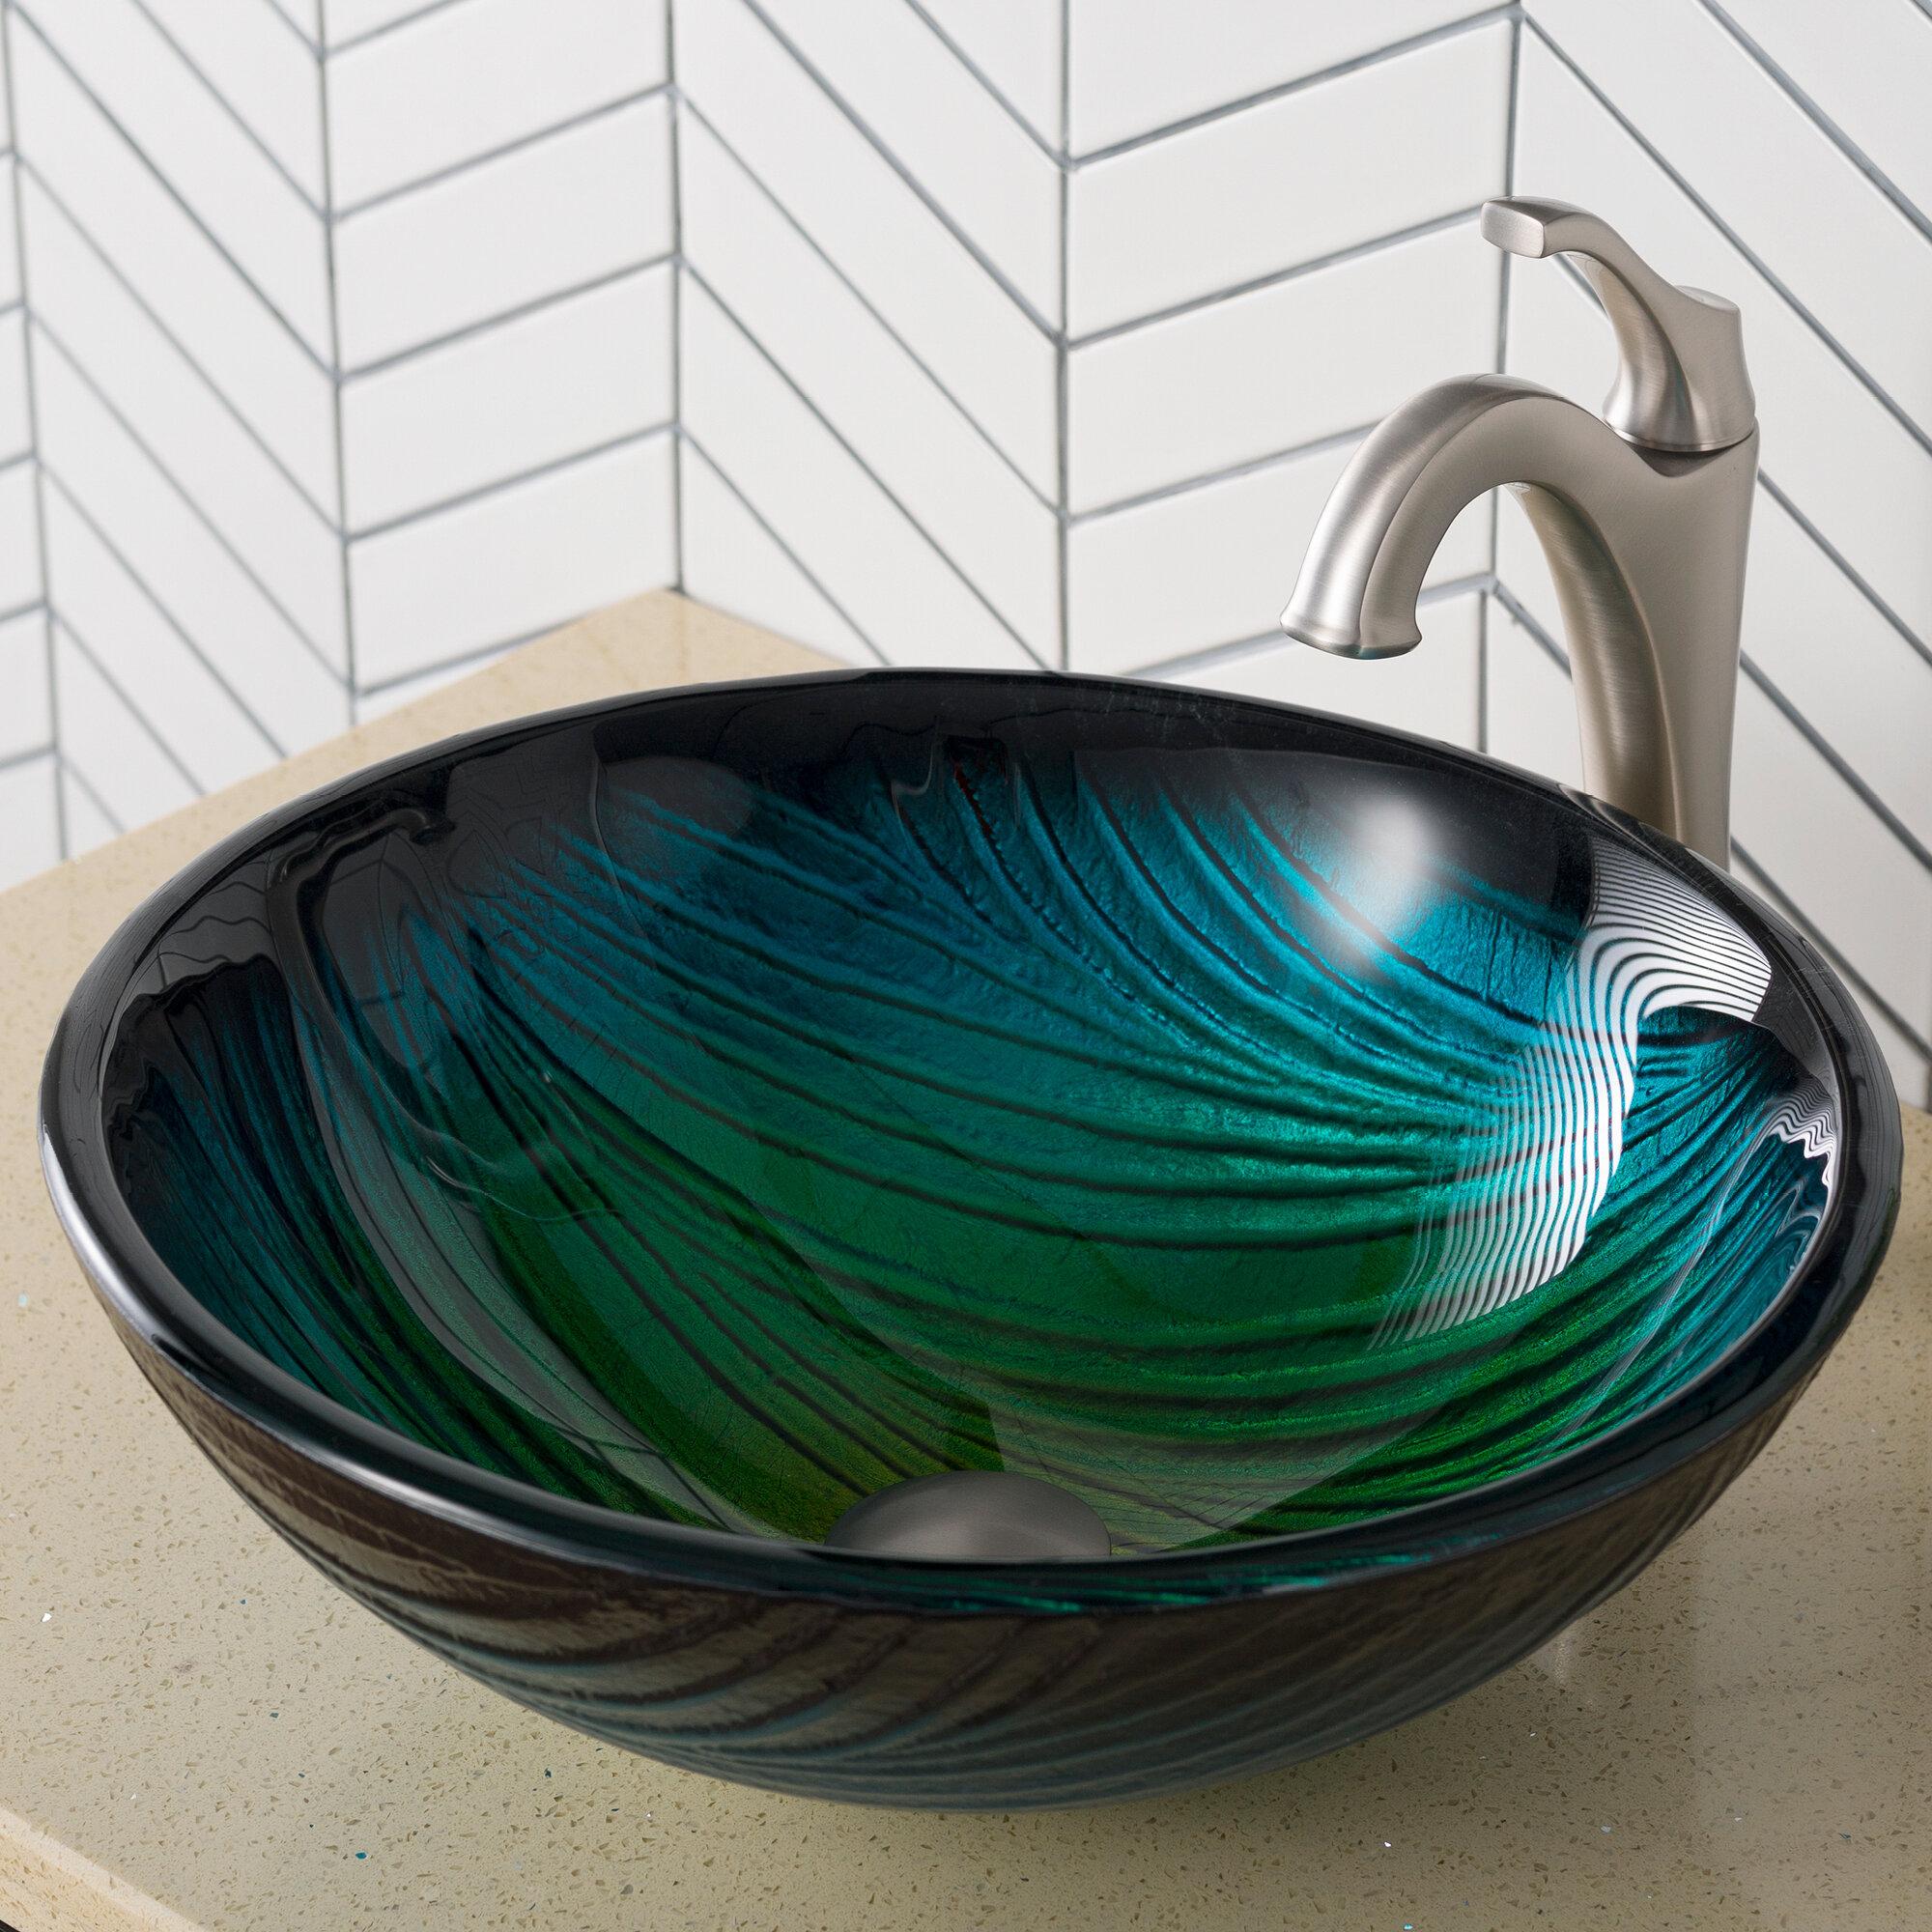 Kraus Nature Series Glass Circular Vessel Bathroom Sink With Faucet Reviews Wayfair